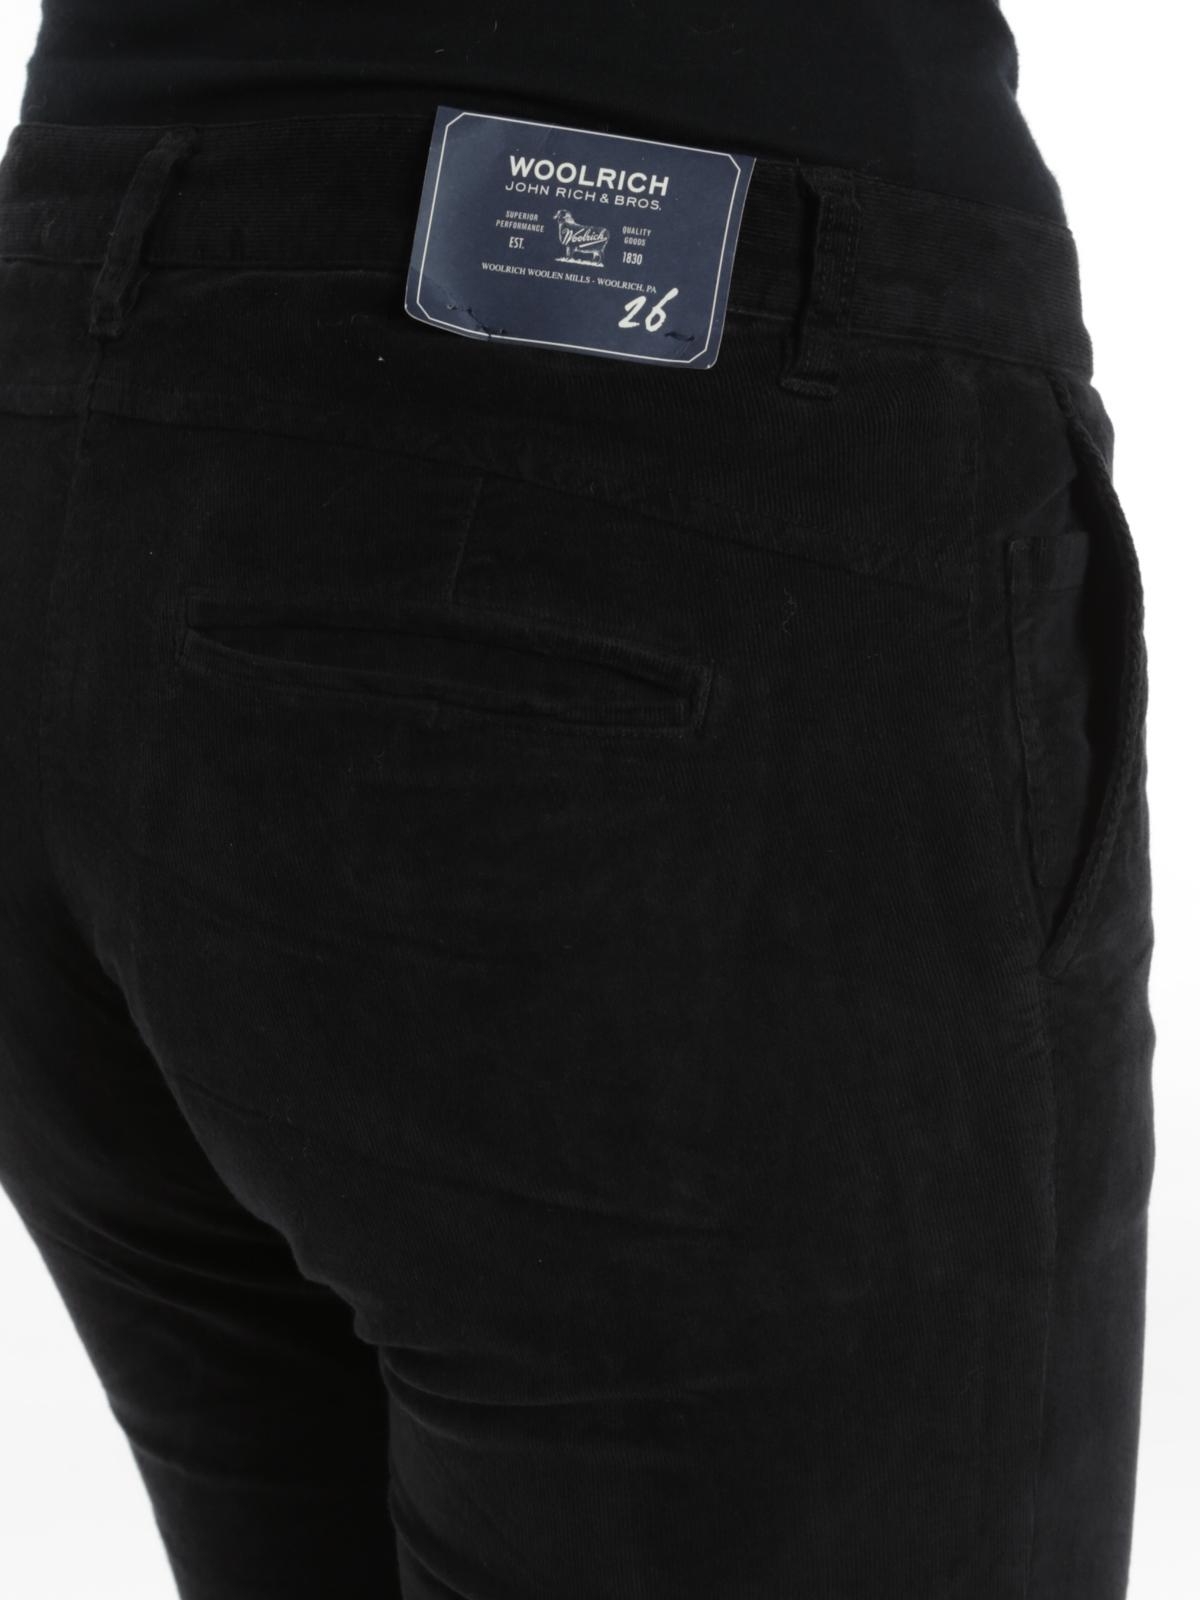 A Pantaloni Woolrich Velluto In Microcostine Casual 68qnUw